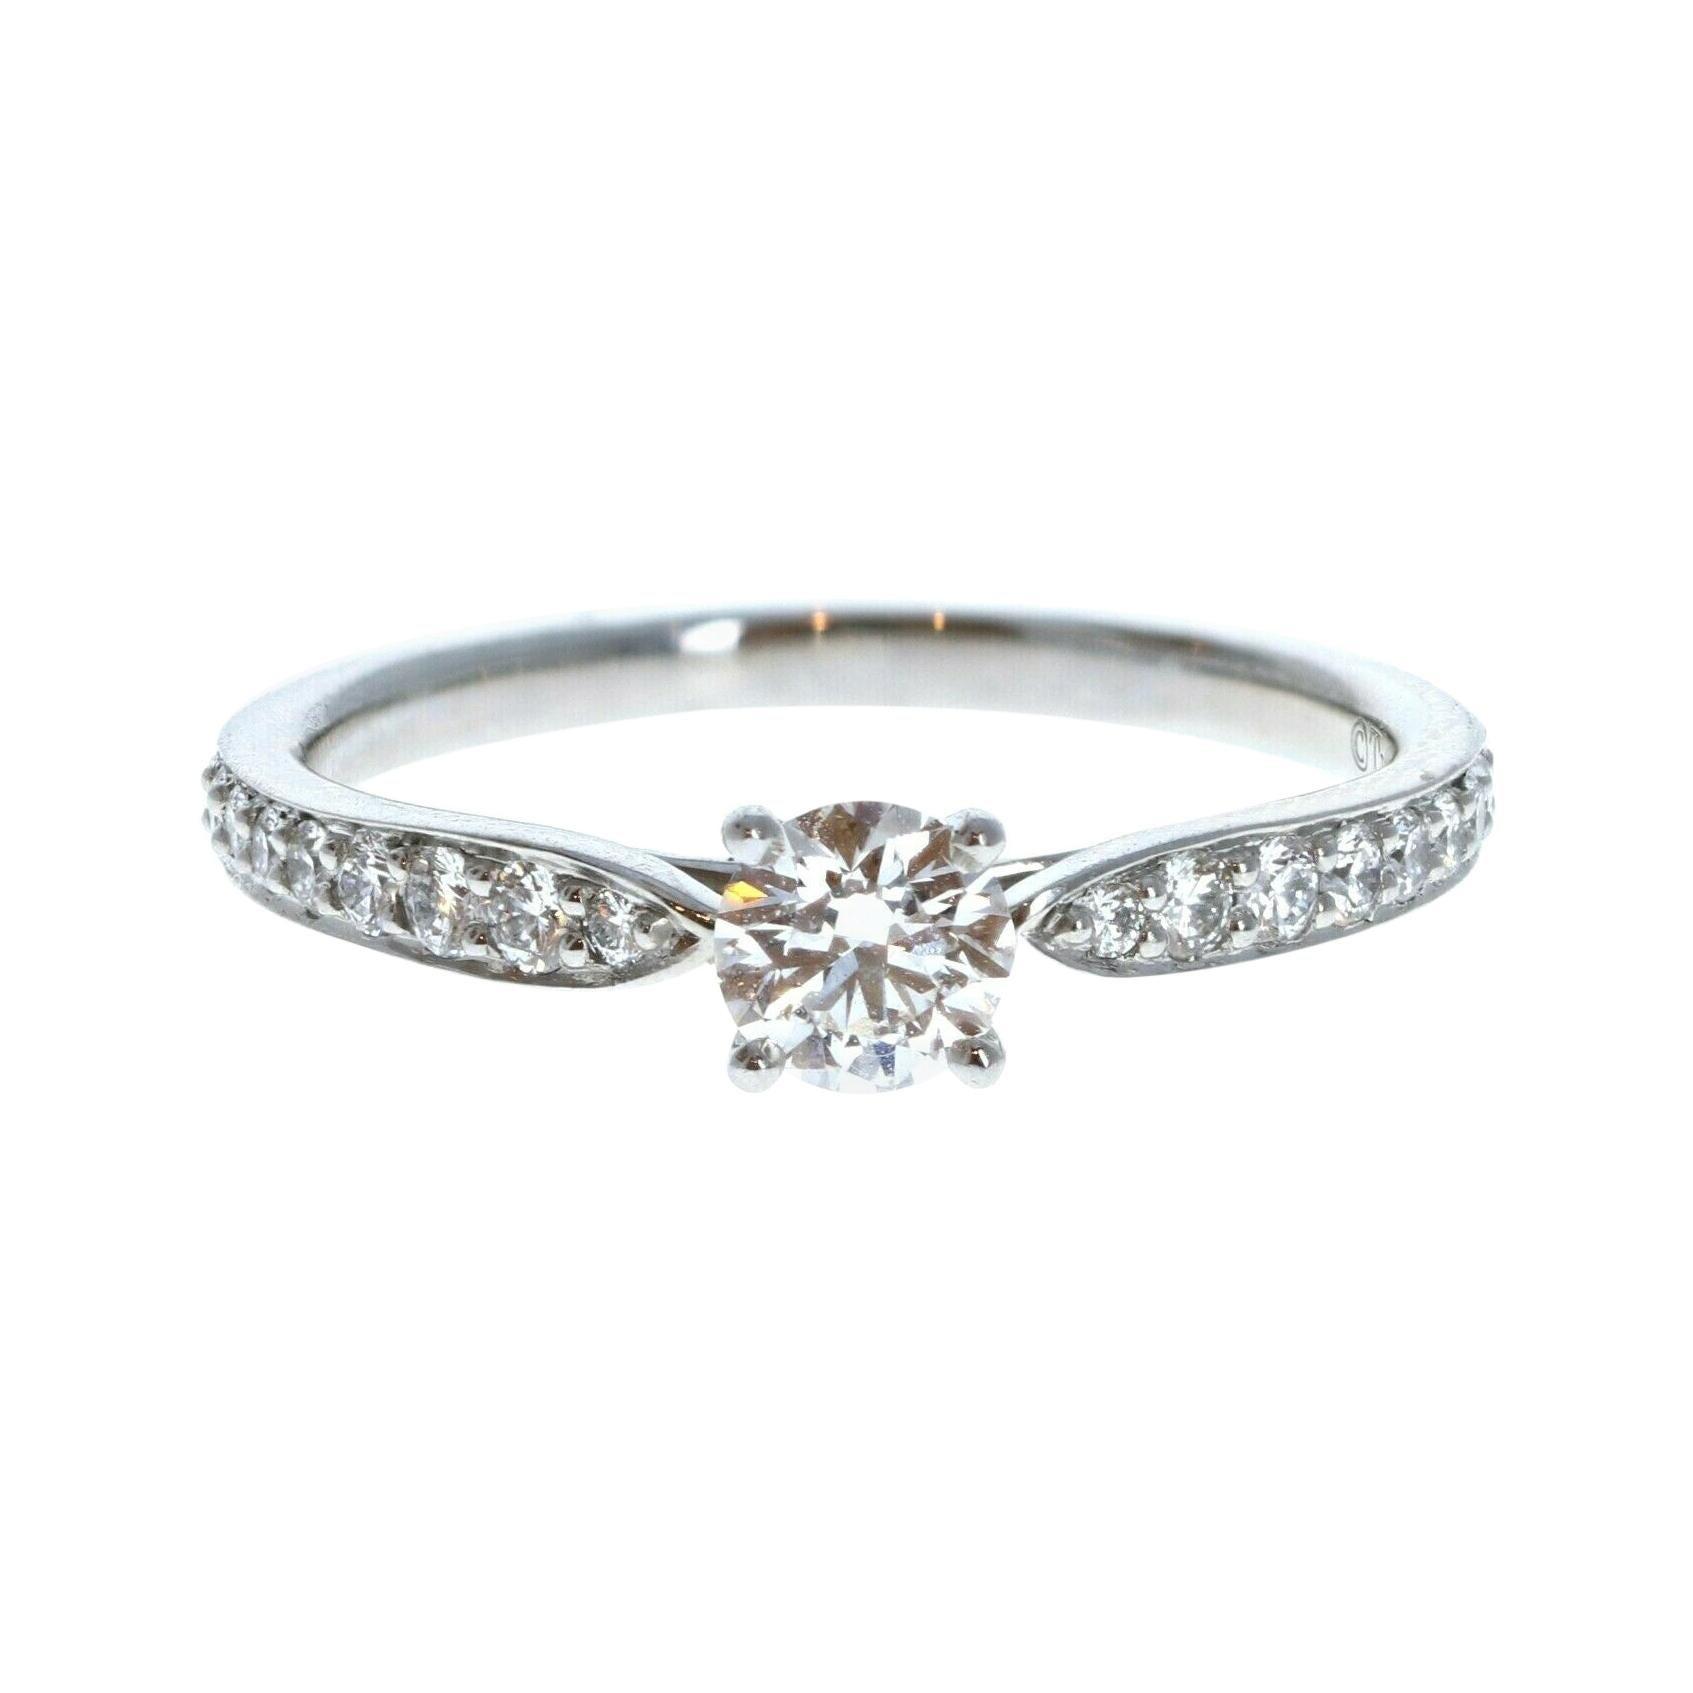 Tiffany & Co. Harmony Platinum & Diamond Engagement Ring 0.33ctw F VVS2